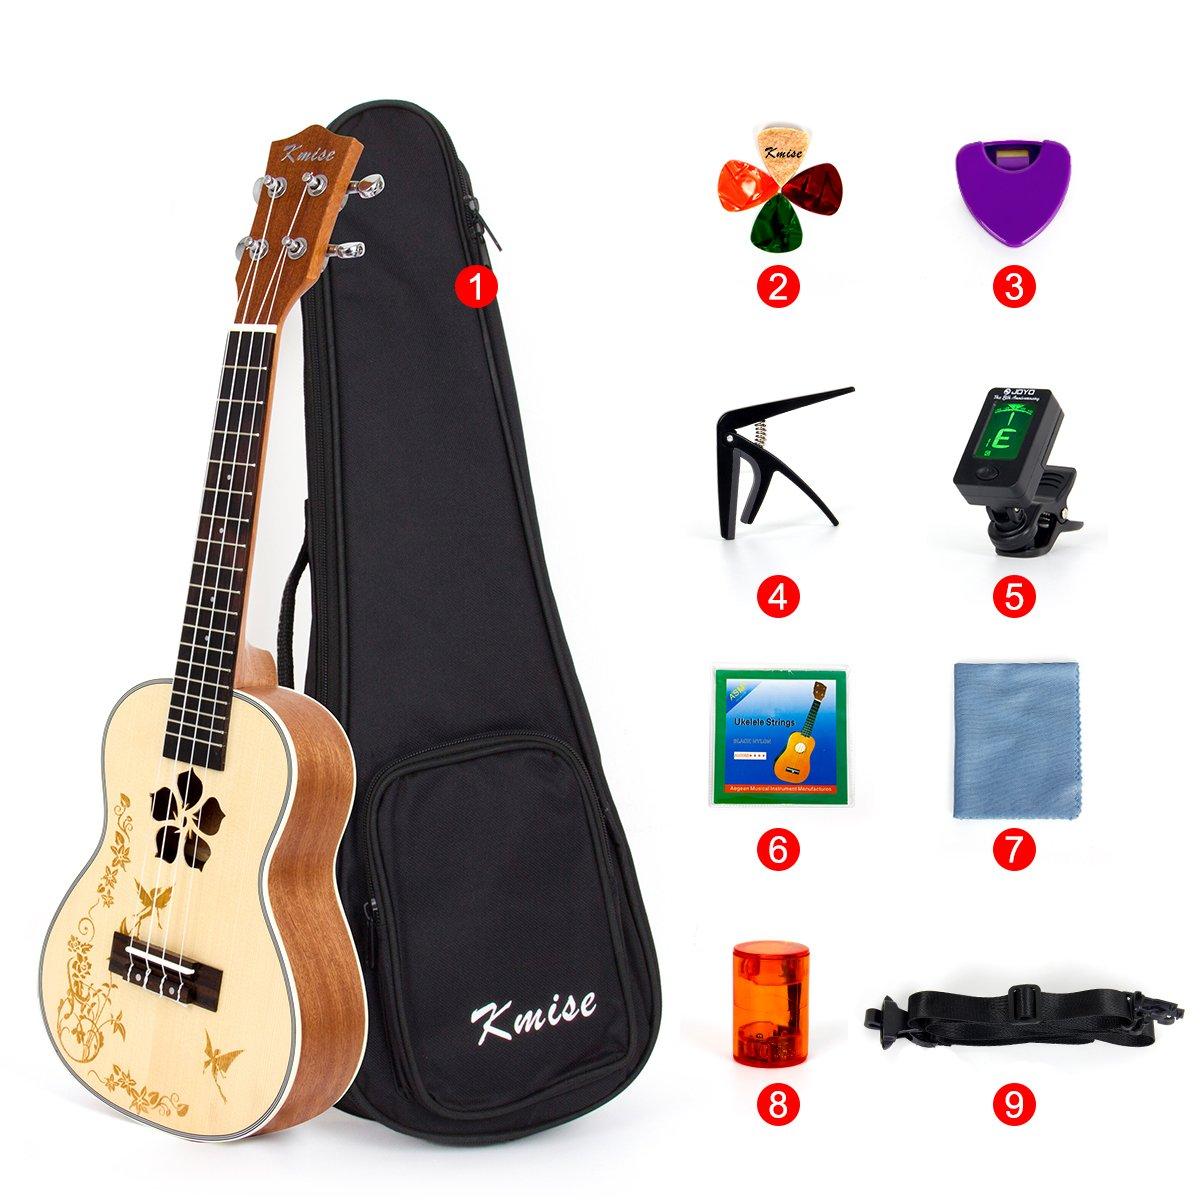 Bag Picks Tuner Strap String Cleaning Cloth Capo Finger Shot Solid Spruce Ukulele 23 Inch Concert Ukelele With 9 Packs Beginner Starter Kit From Kmise